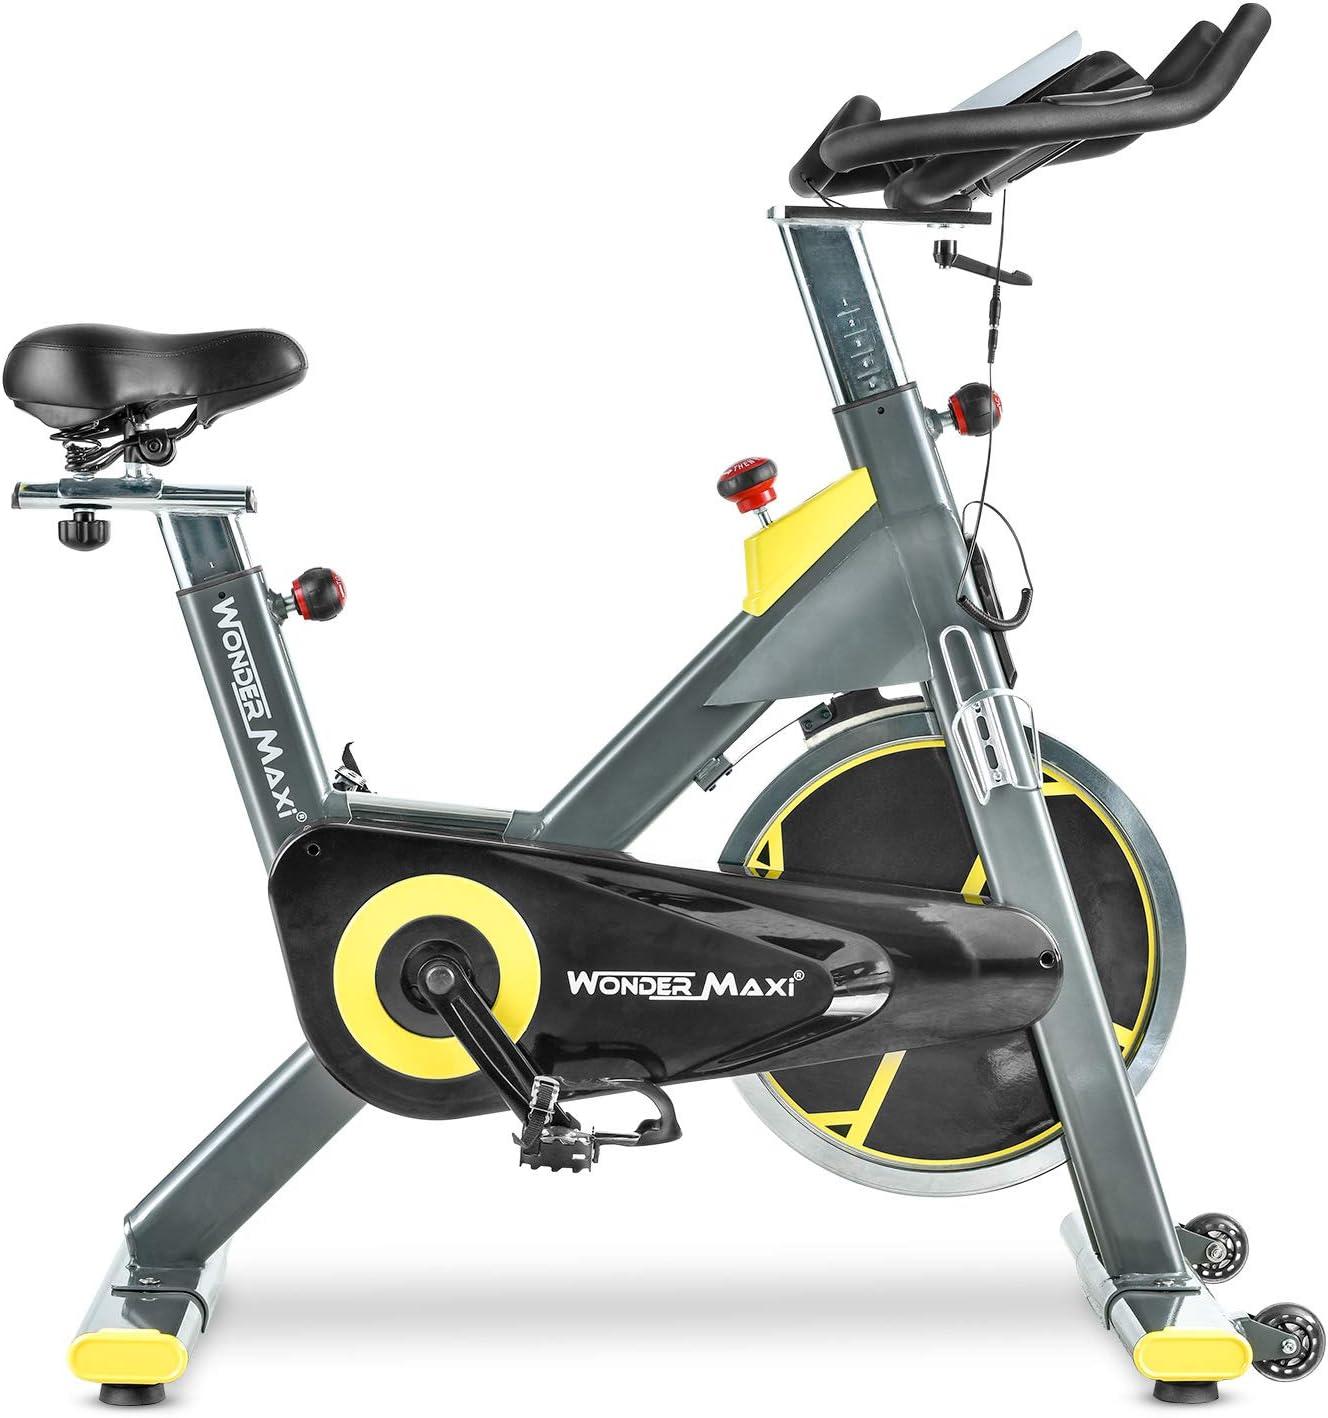 Wonder Maxi Bicicleta de ciclismo para interiores, bicicleta ...